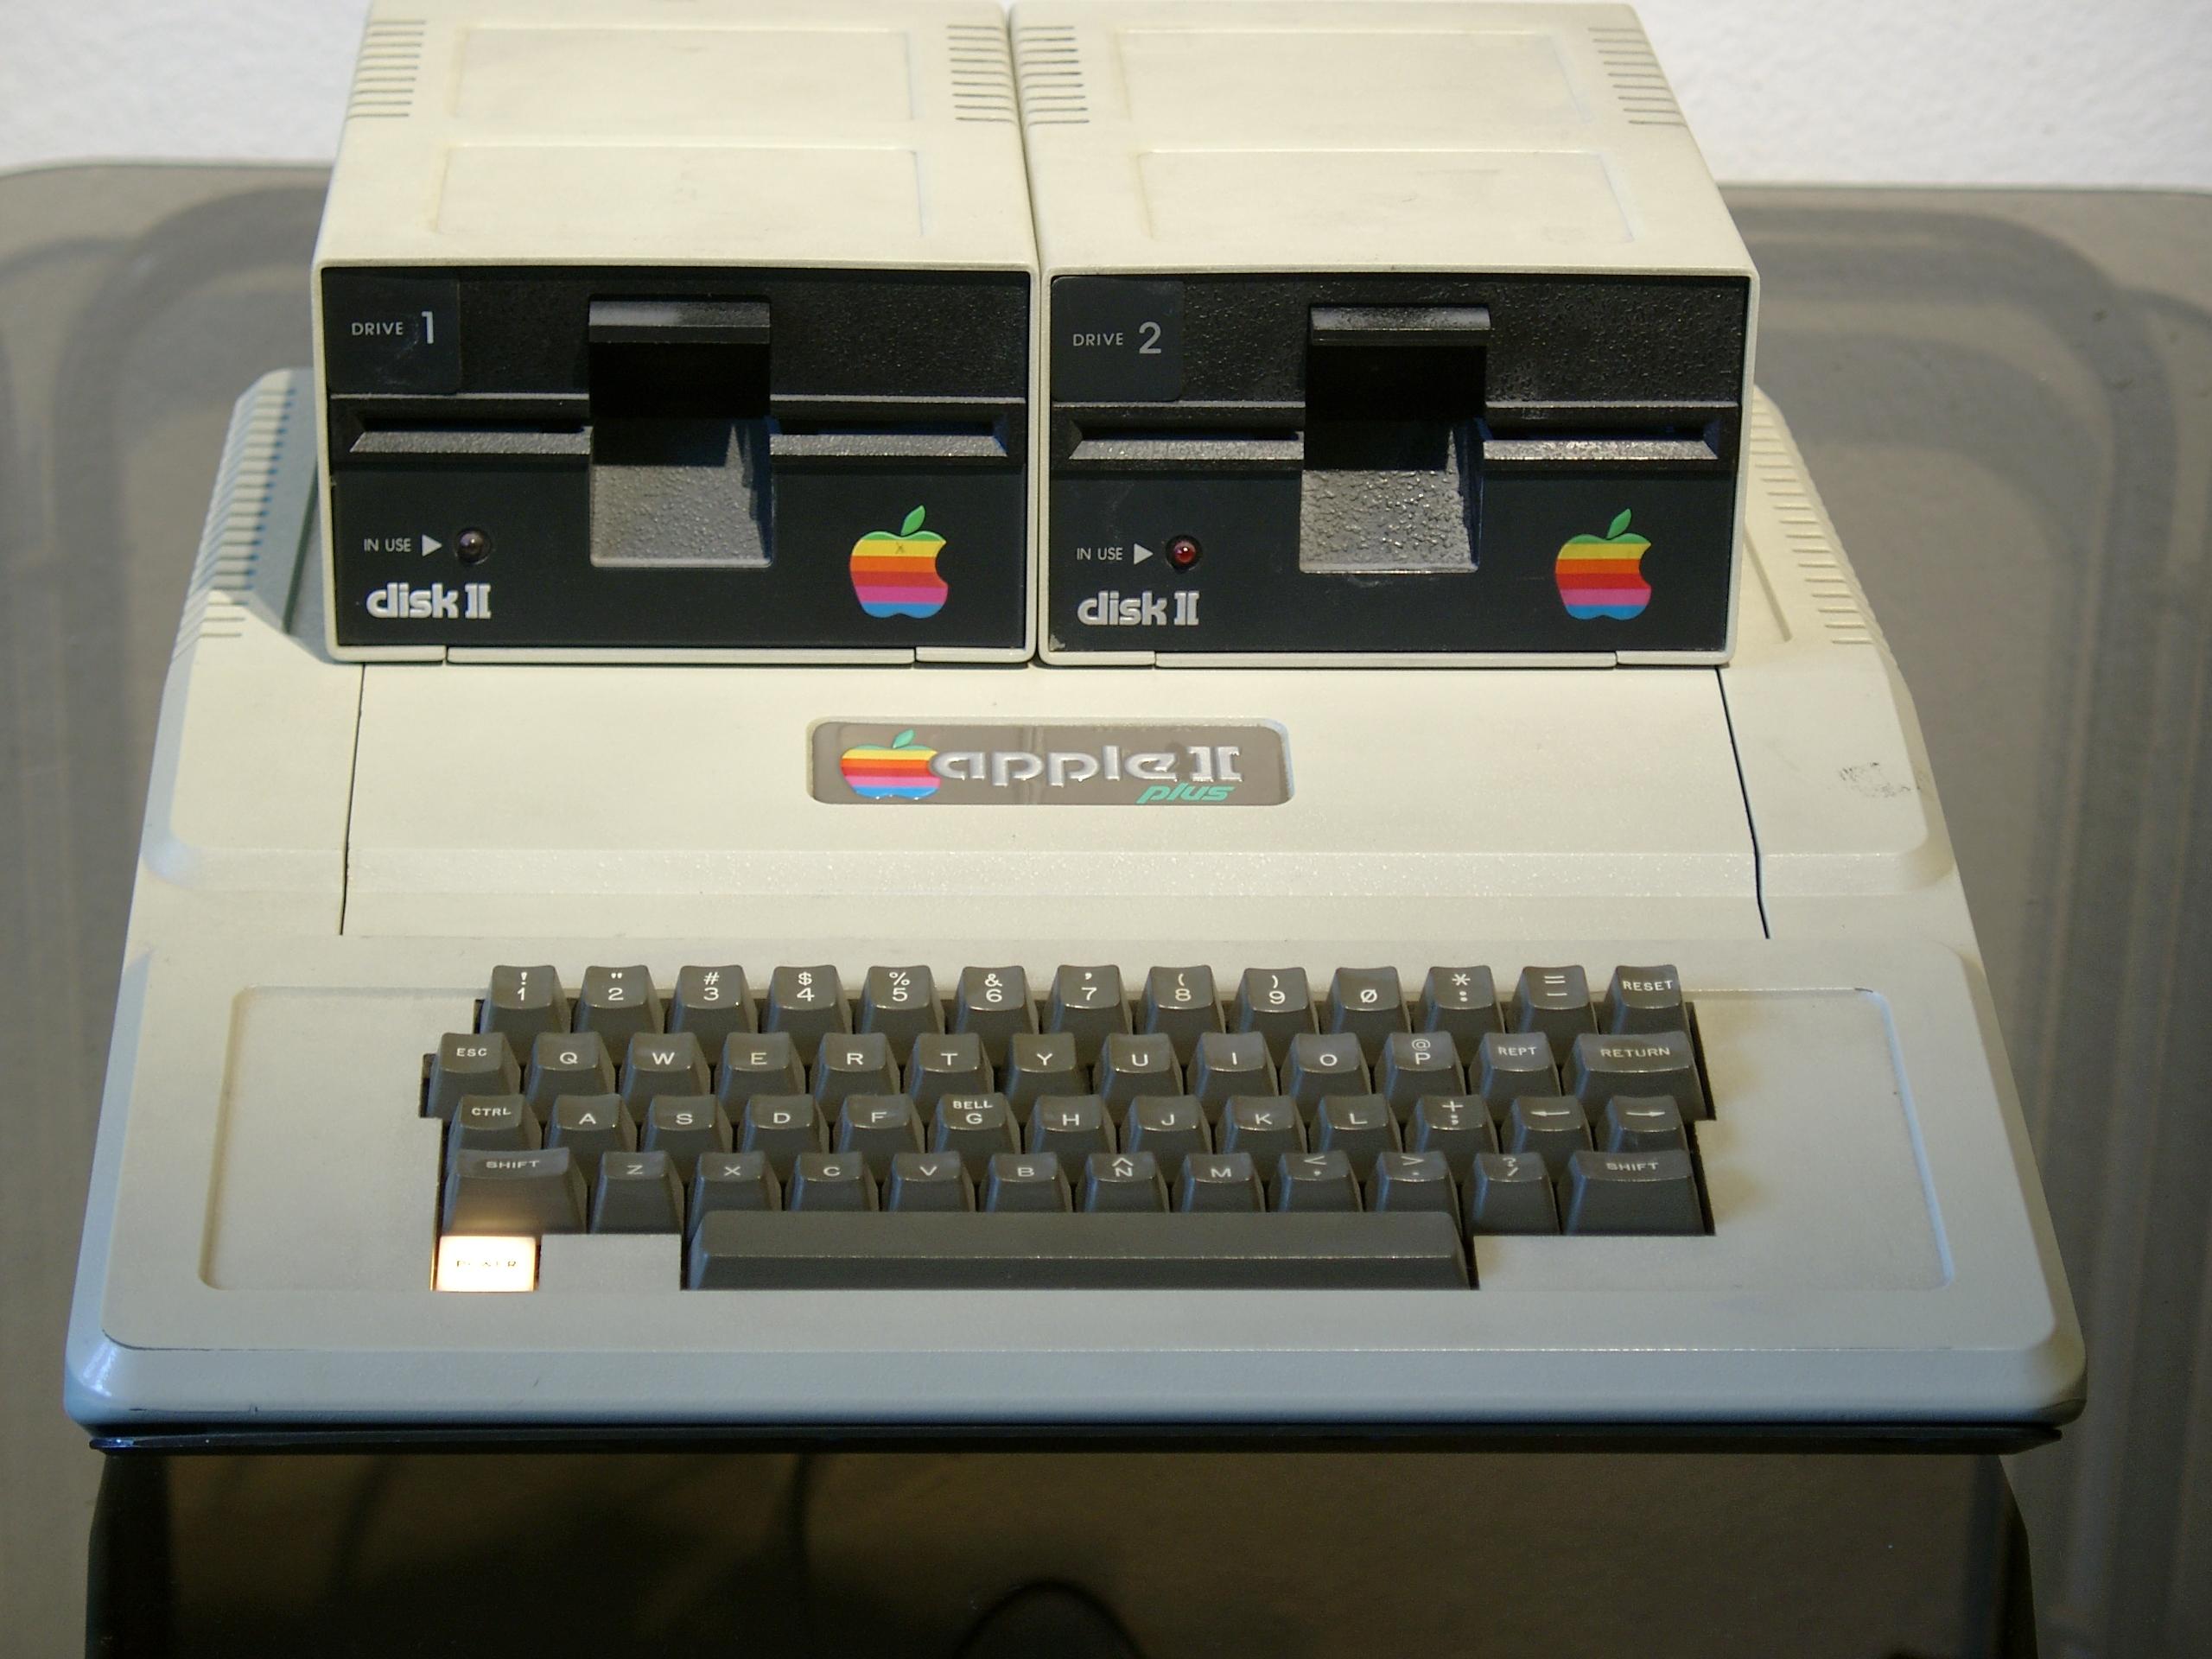 Modne ubrania File:Apple II Euro Plus mit Laufwerken.JPG - Wikimedia Commons BN95